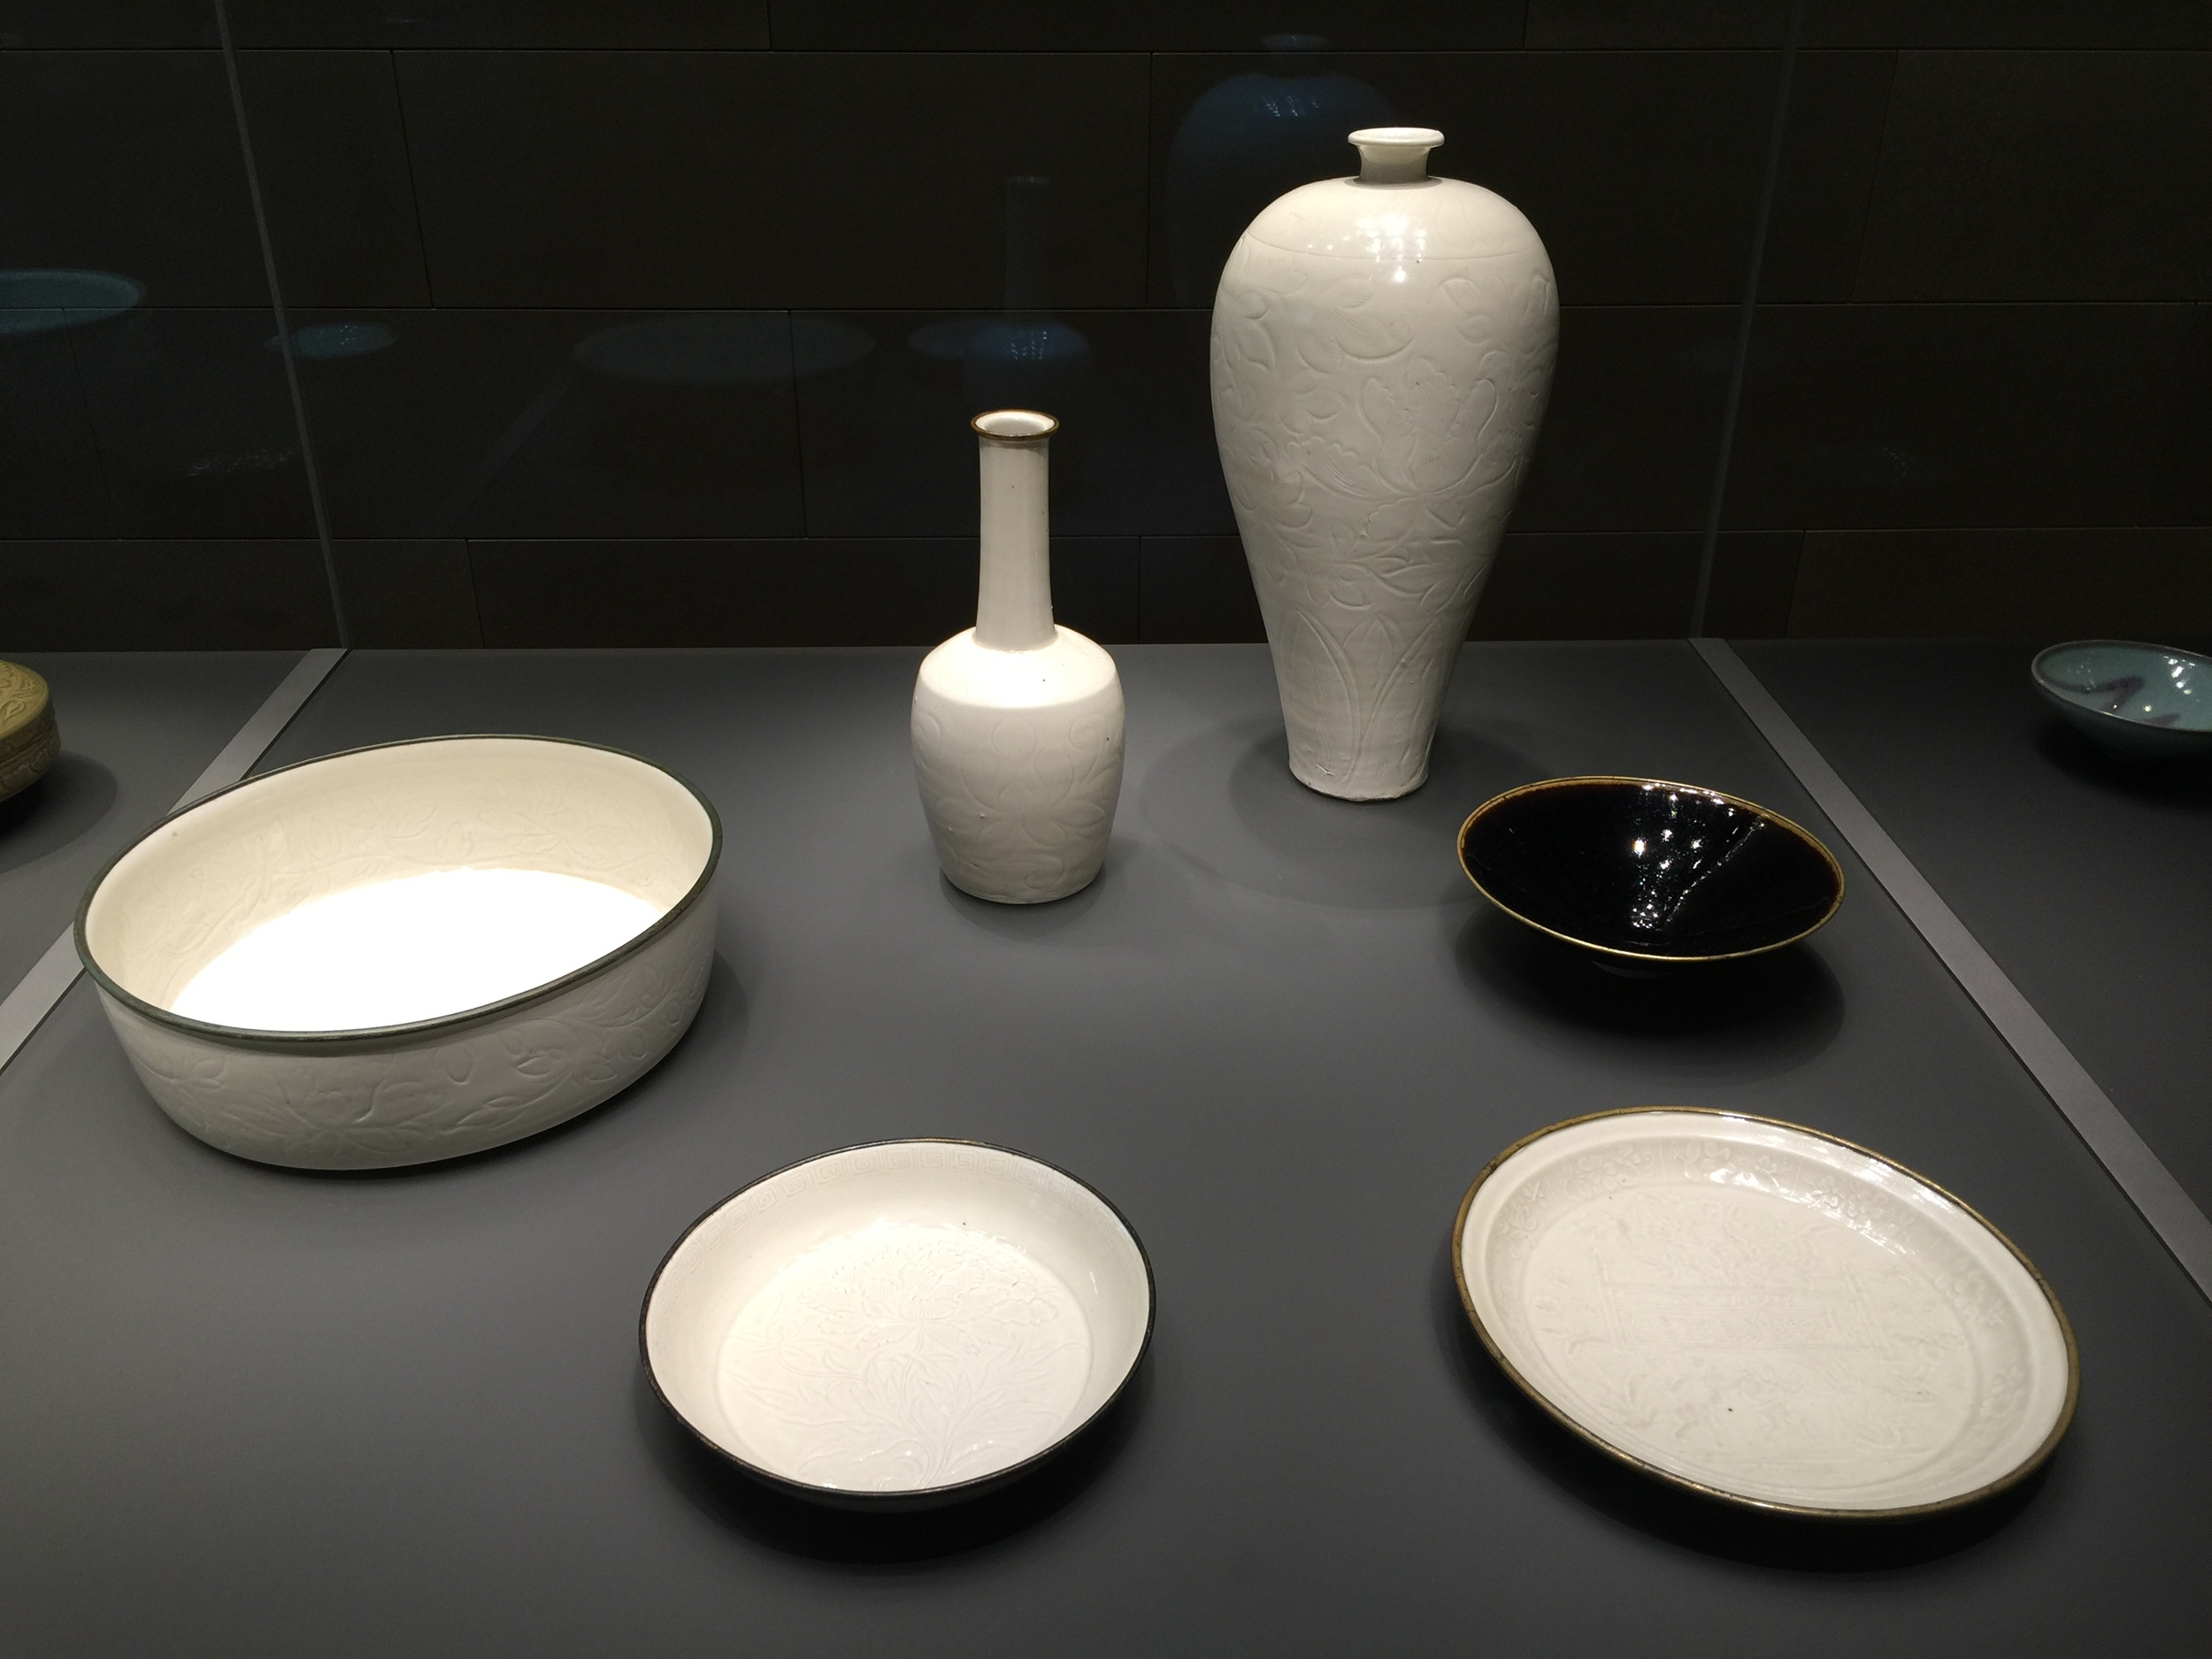 Chinese-Porcelain-British-Museum-Percival-David-jessewaugh.com-9.jpg